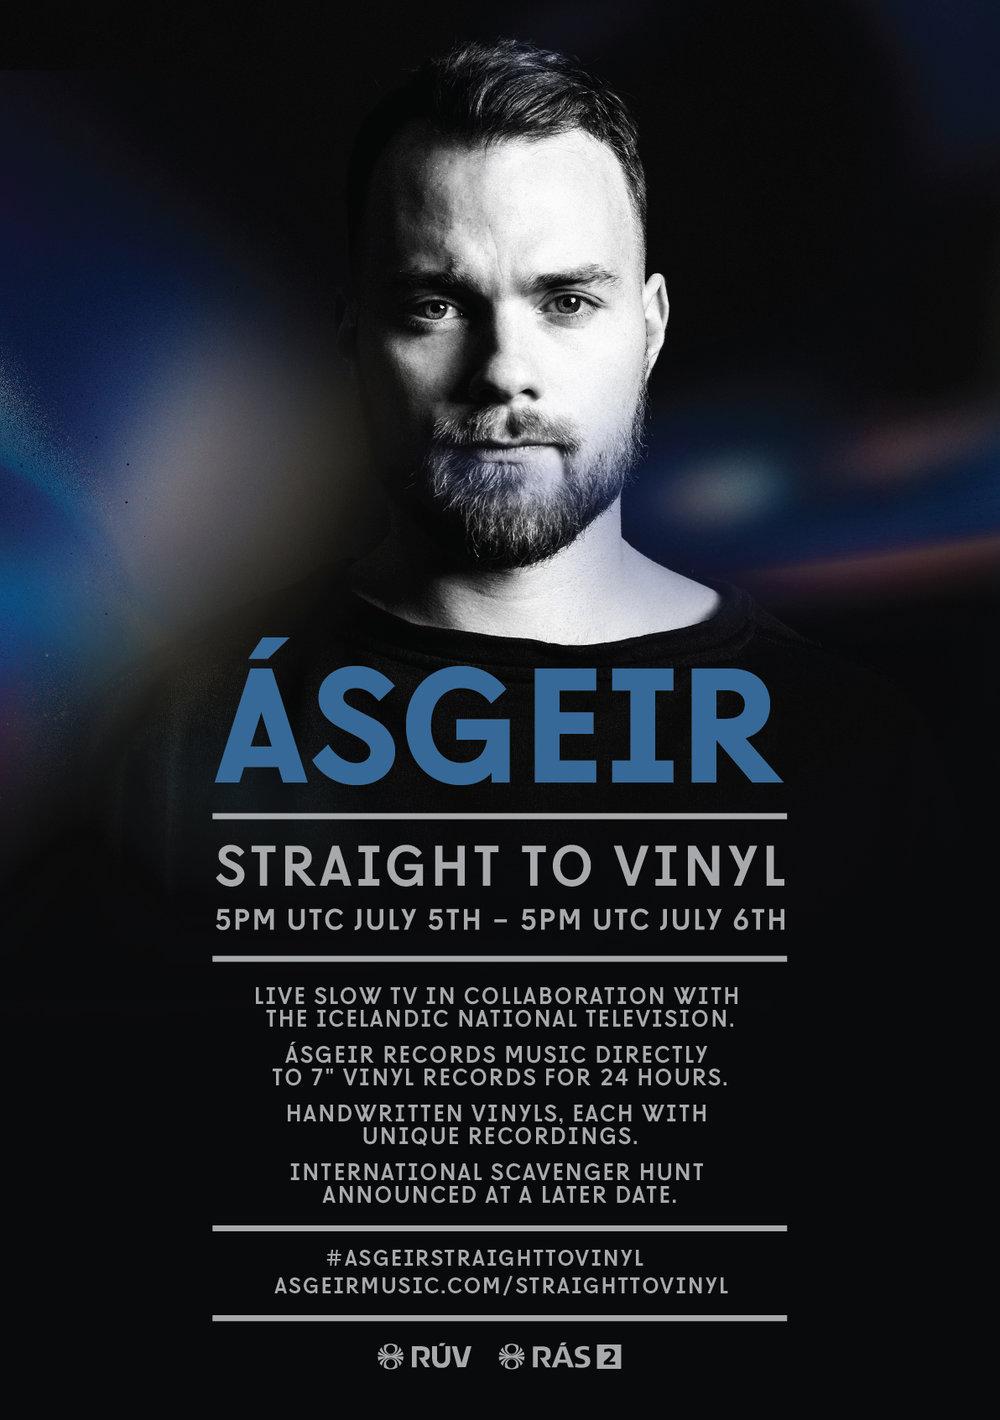 ásgeir-STW-flyer-02.jpg